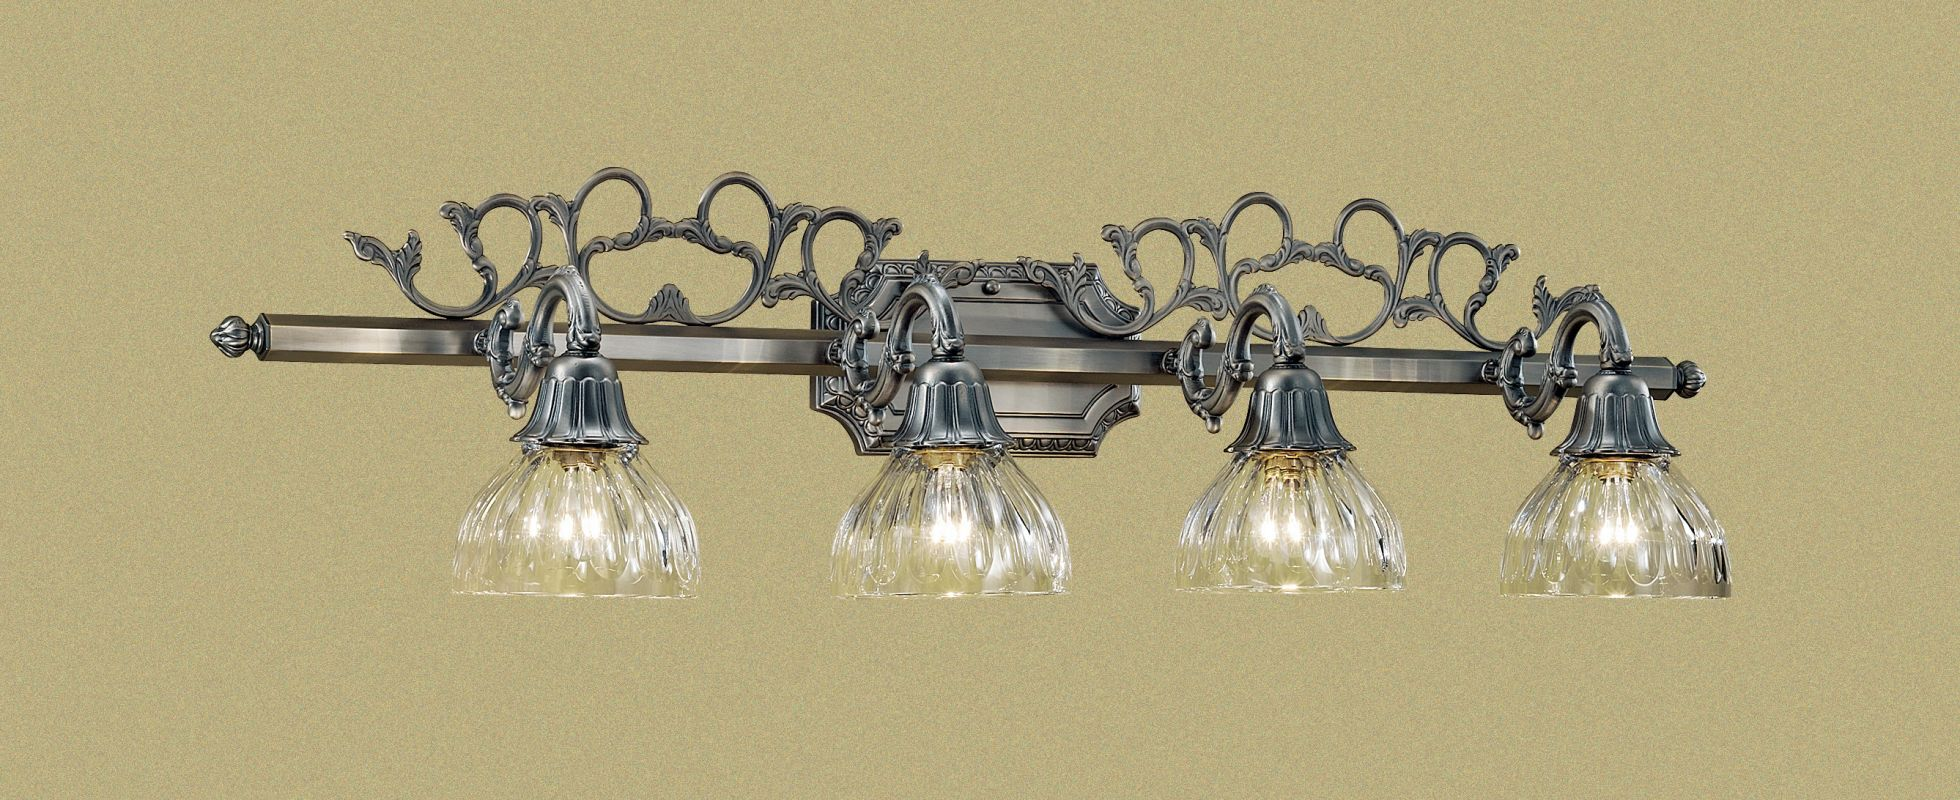 "Classic Lighting 57368 10"" Cast Brass & Lead Crystal 4 Light Vanity"